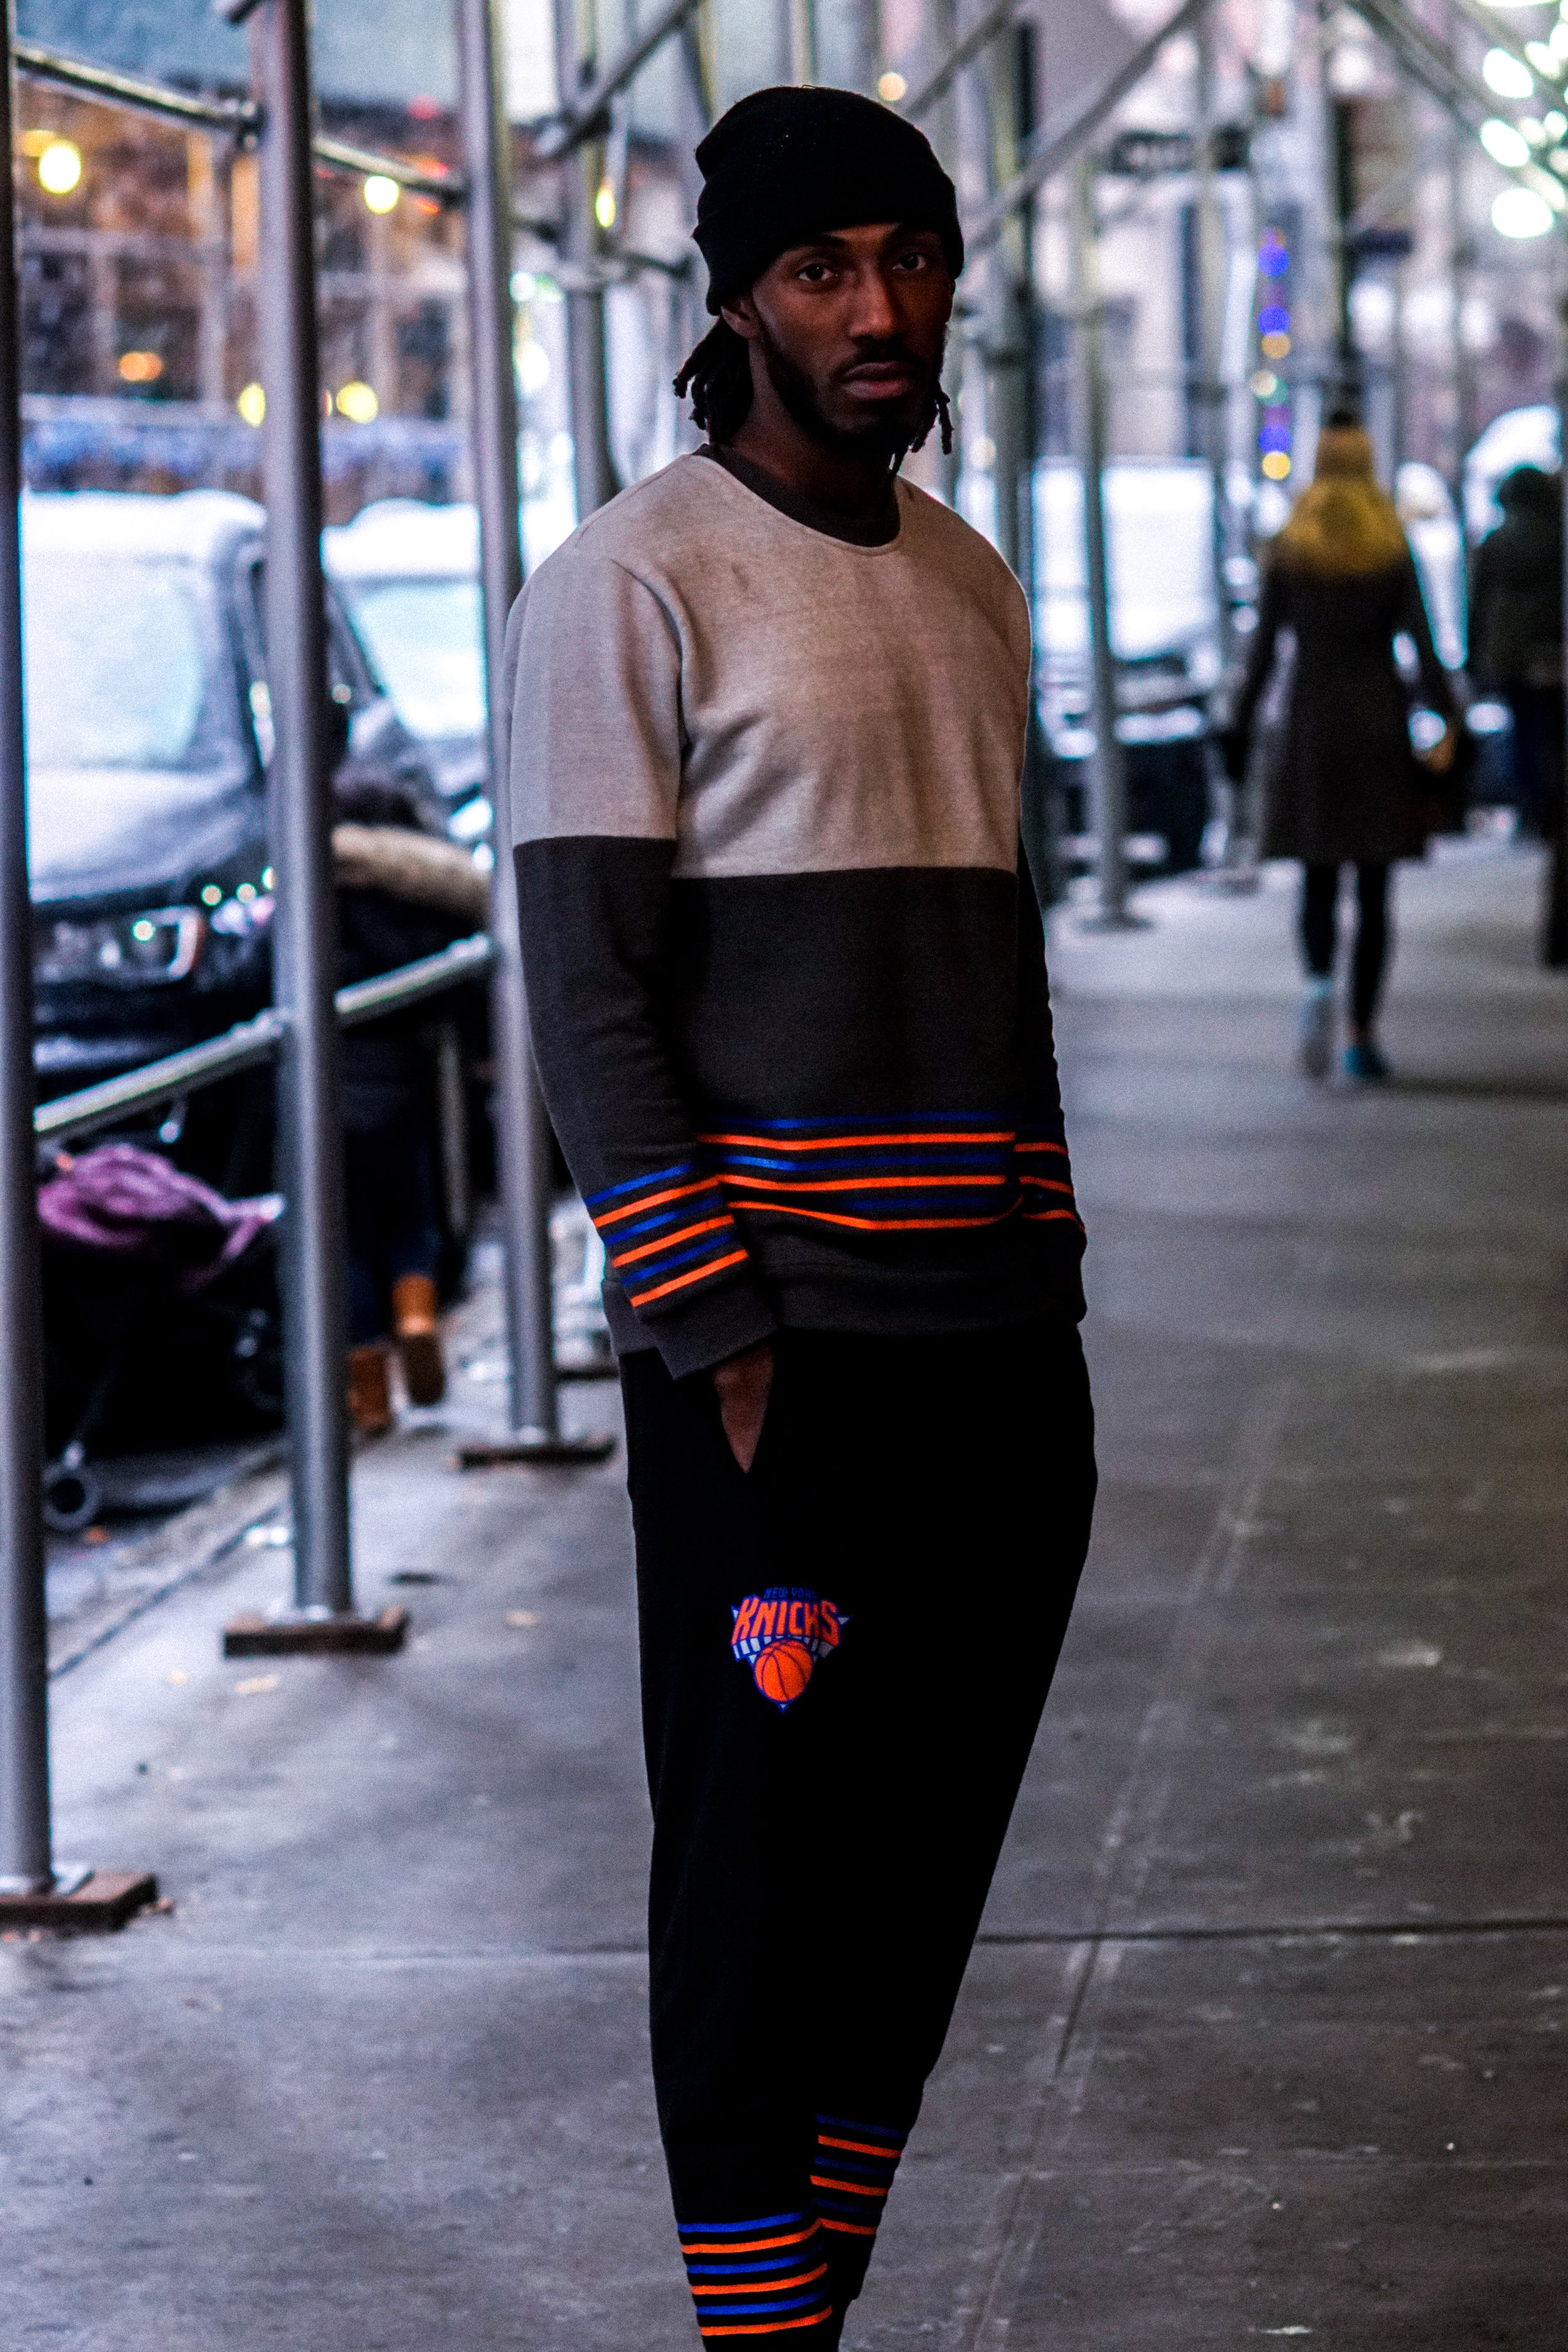 Grungy Gentleman x NY Knicks 14.jpg